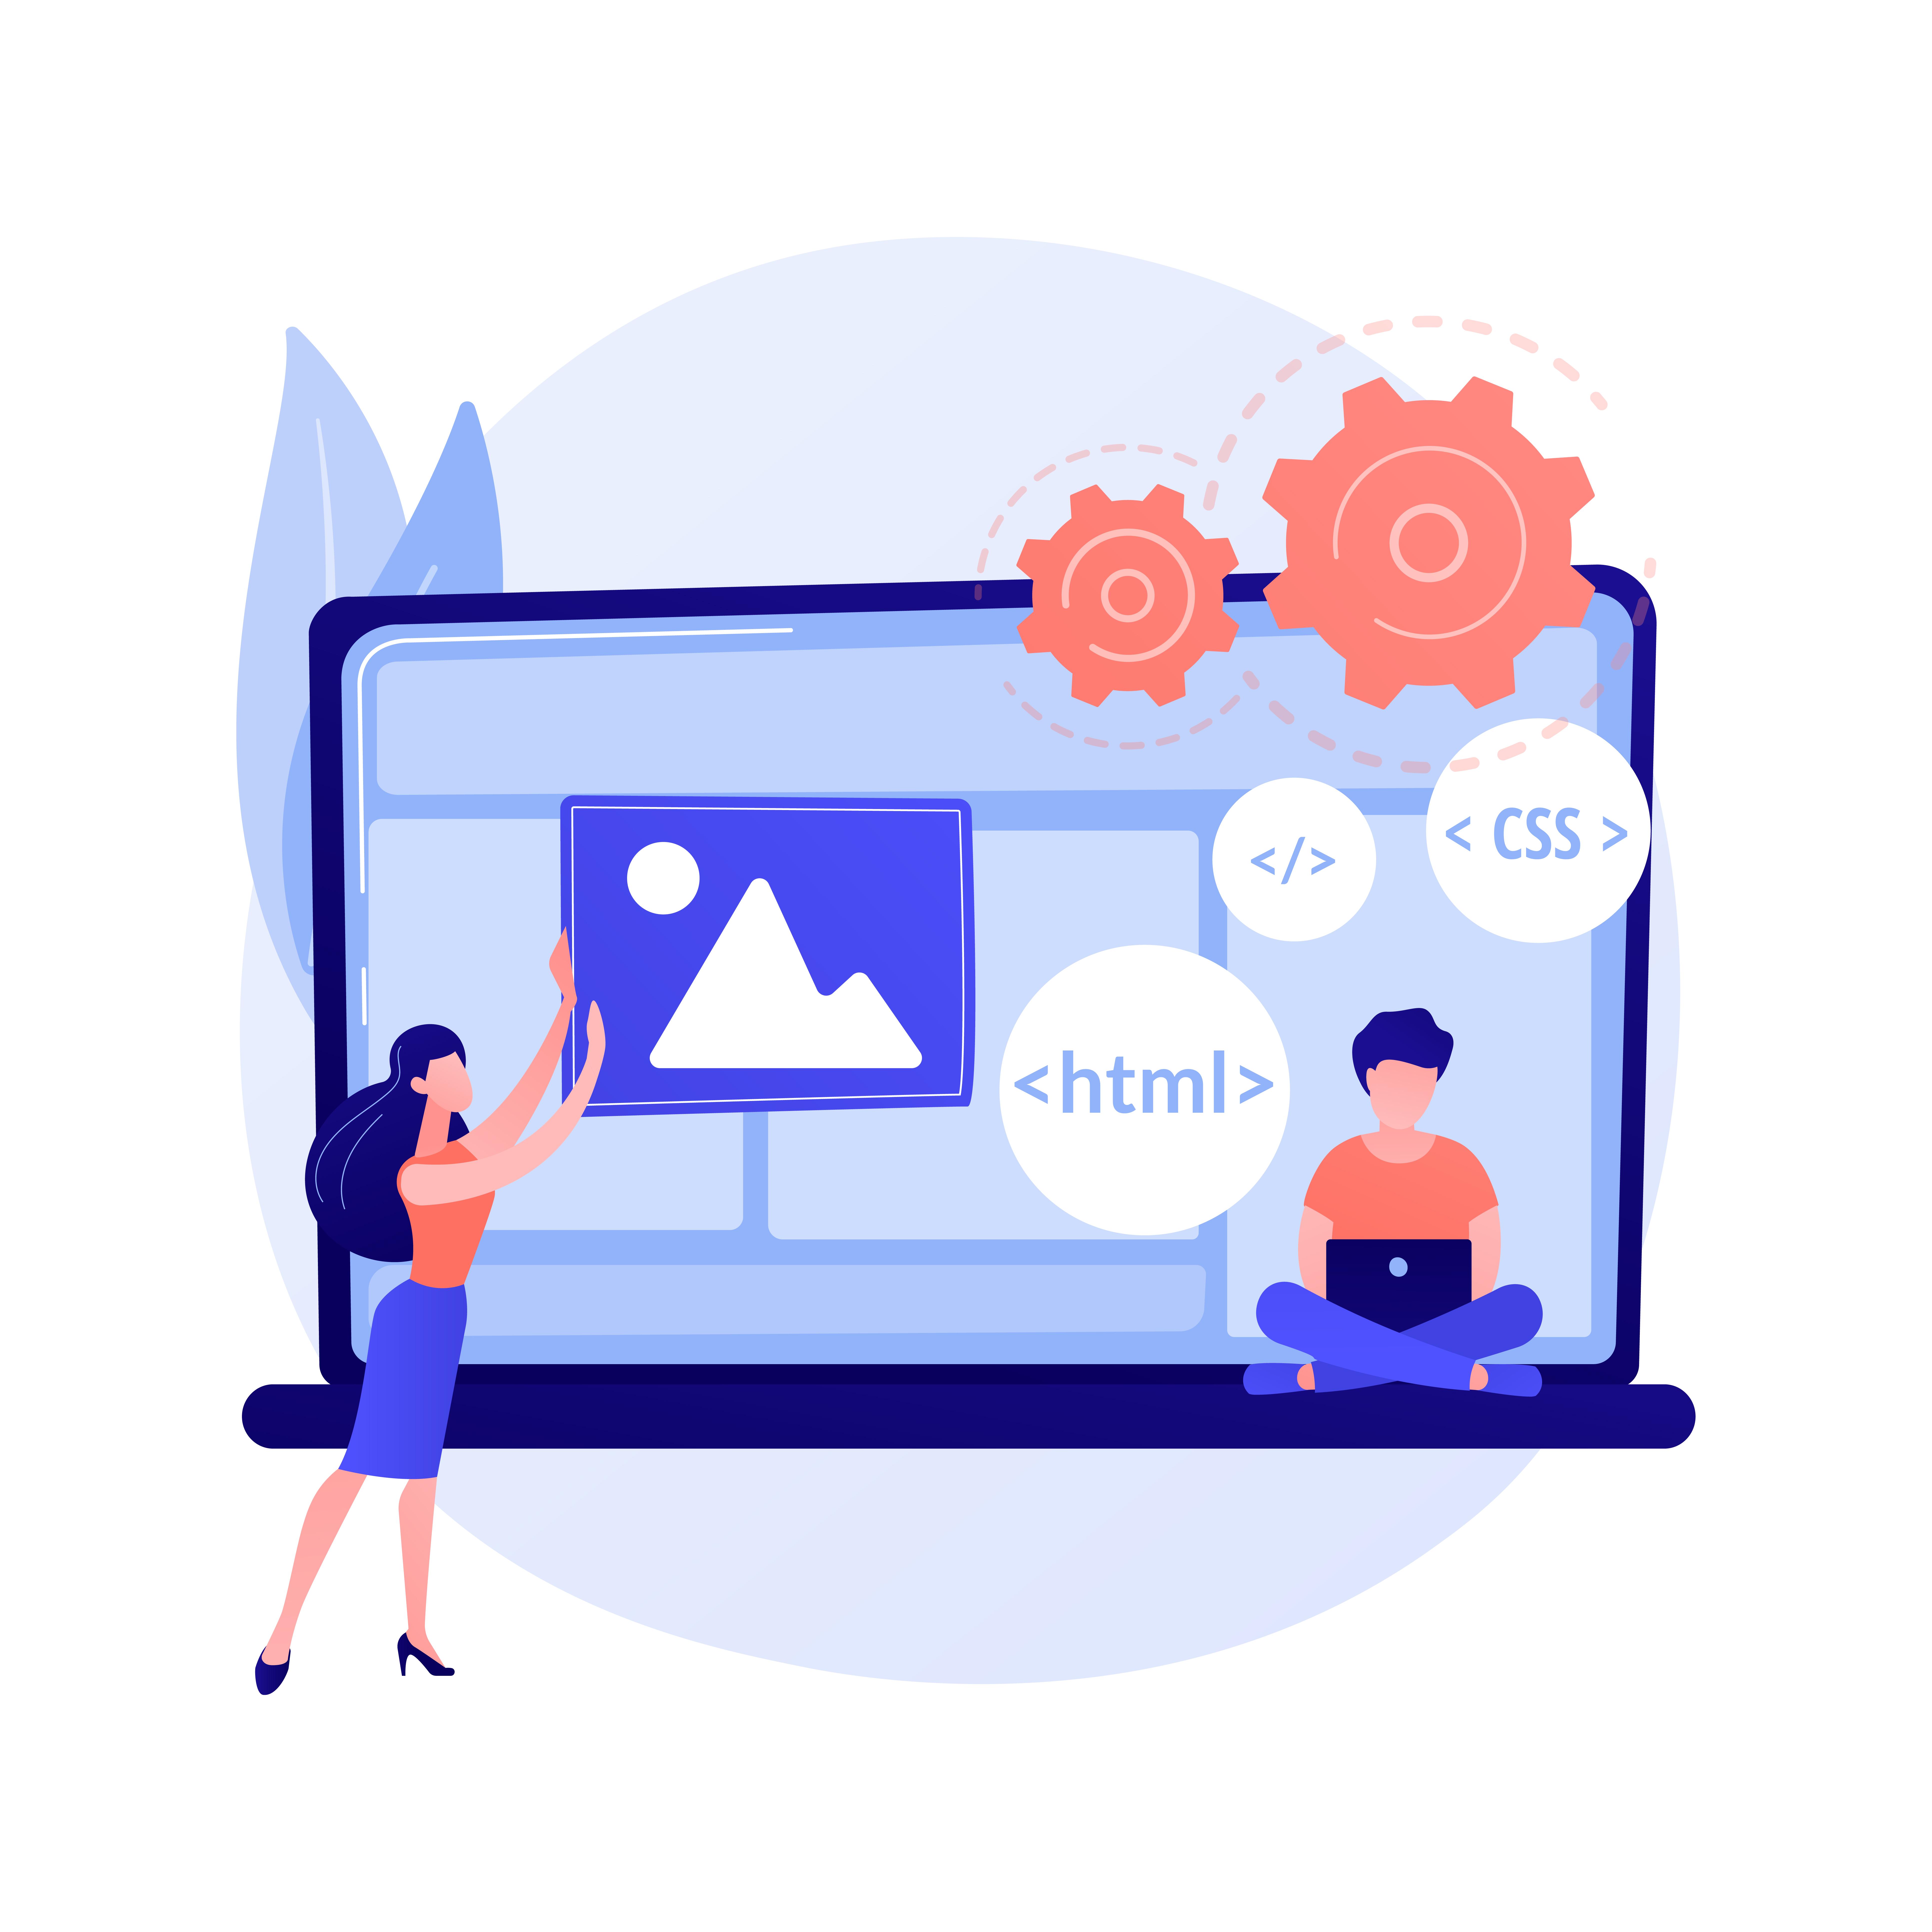 web design and development companies in california